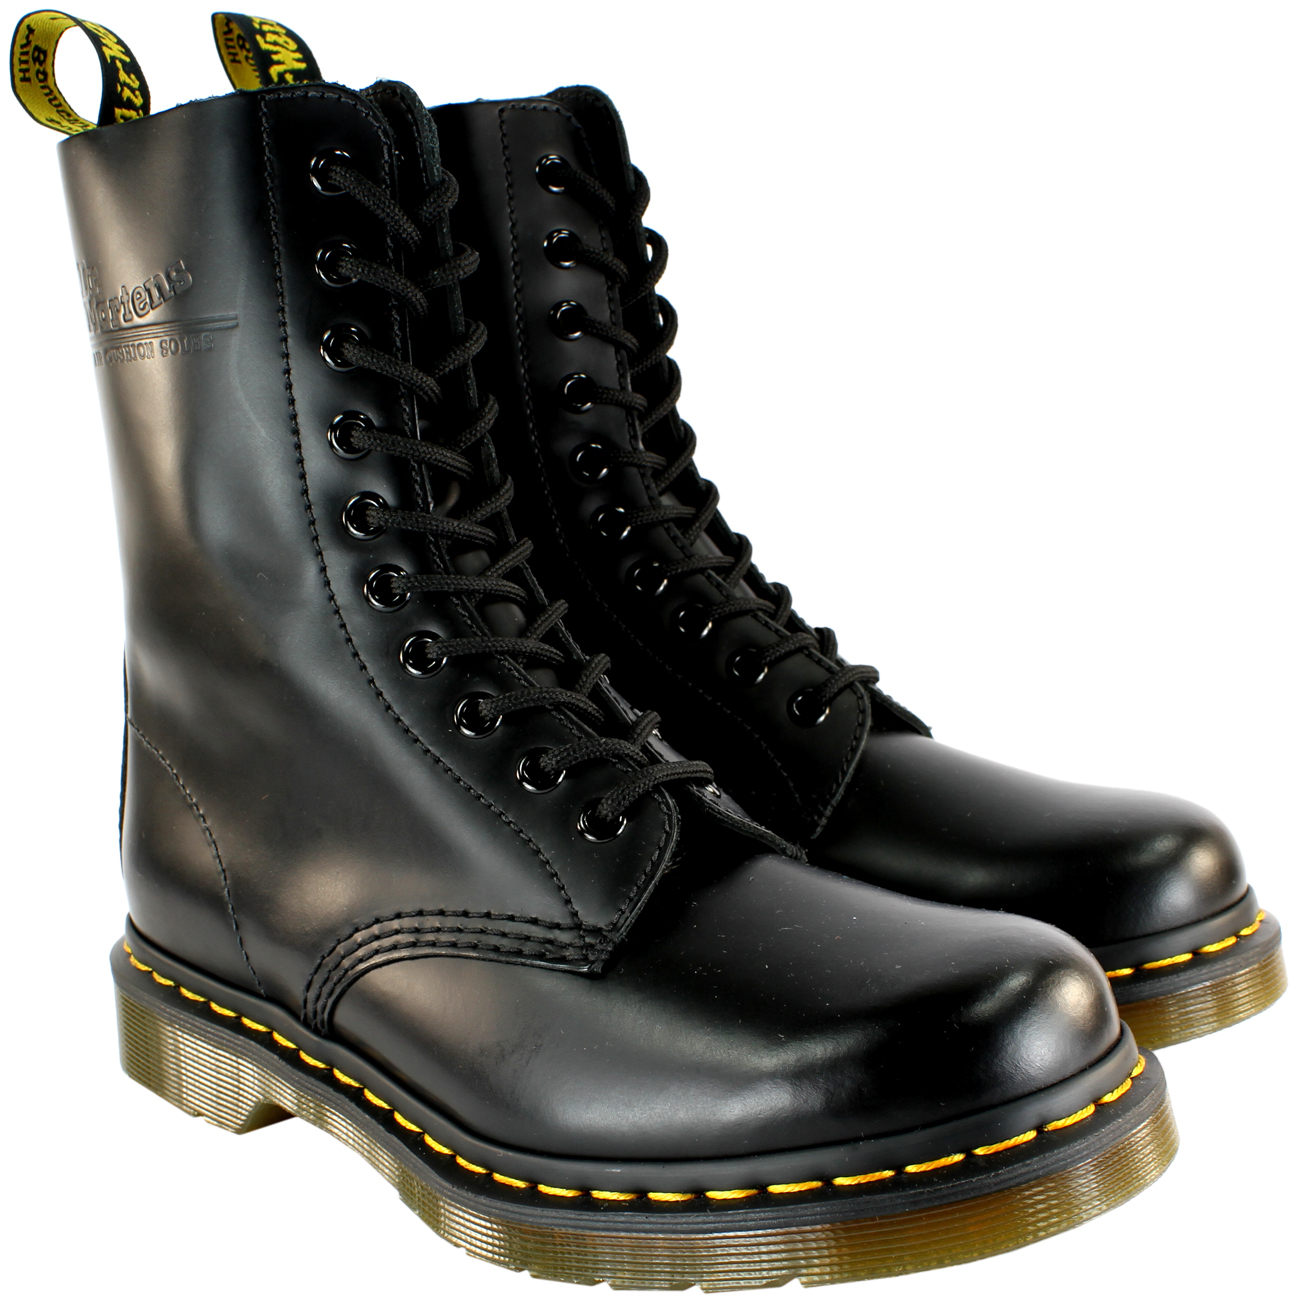 Dr Martens 1490 Original Ankle Boots